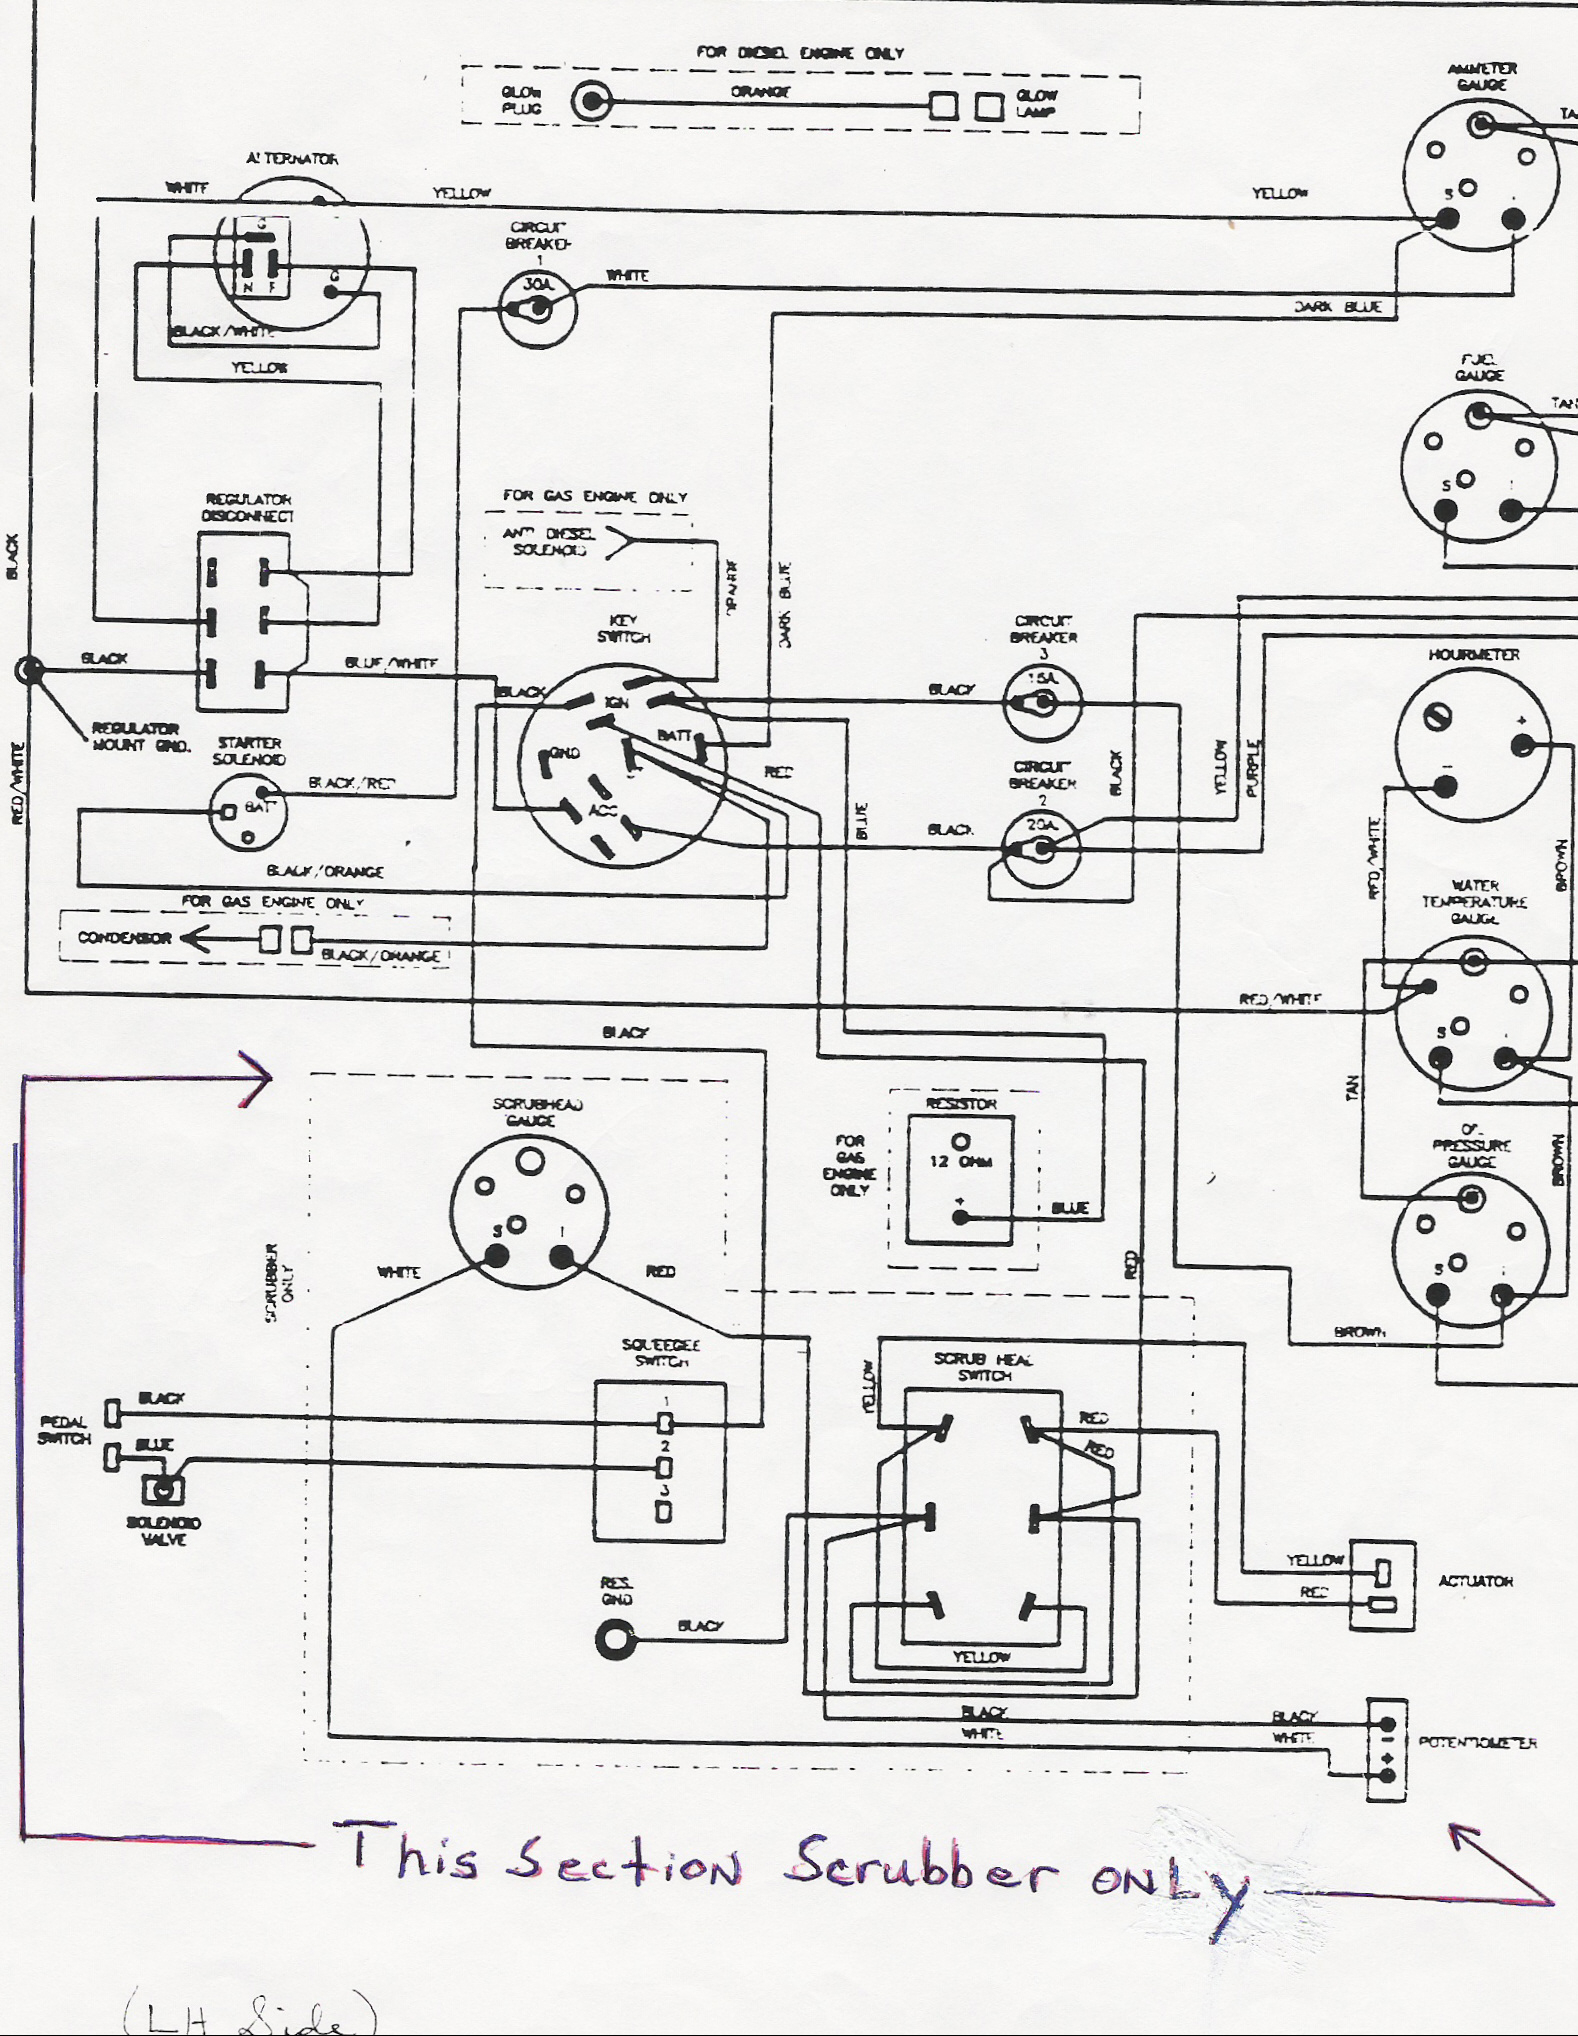 Onan Rv Generator Wiring Diagram from 2020cadillac.com